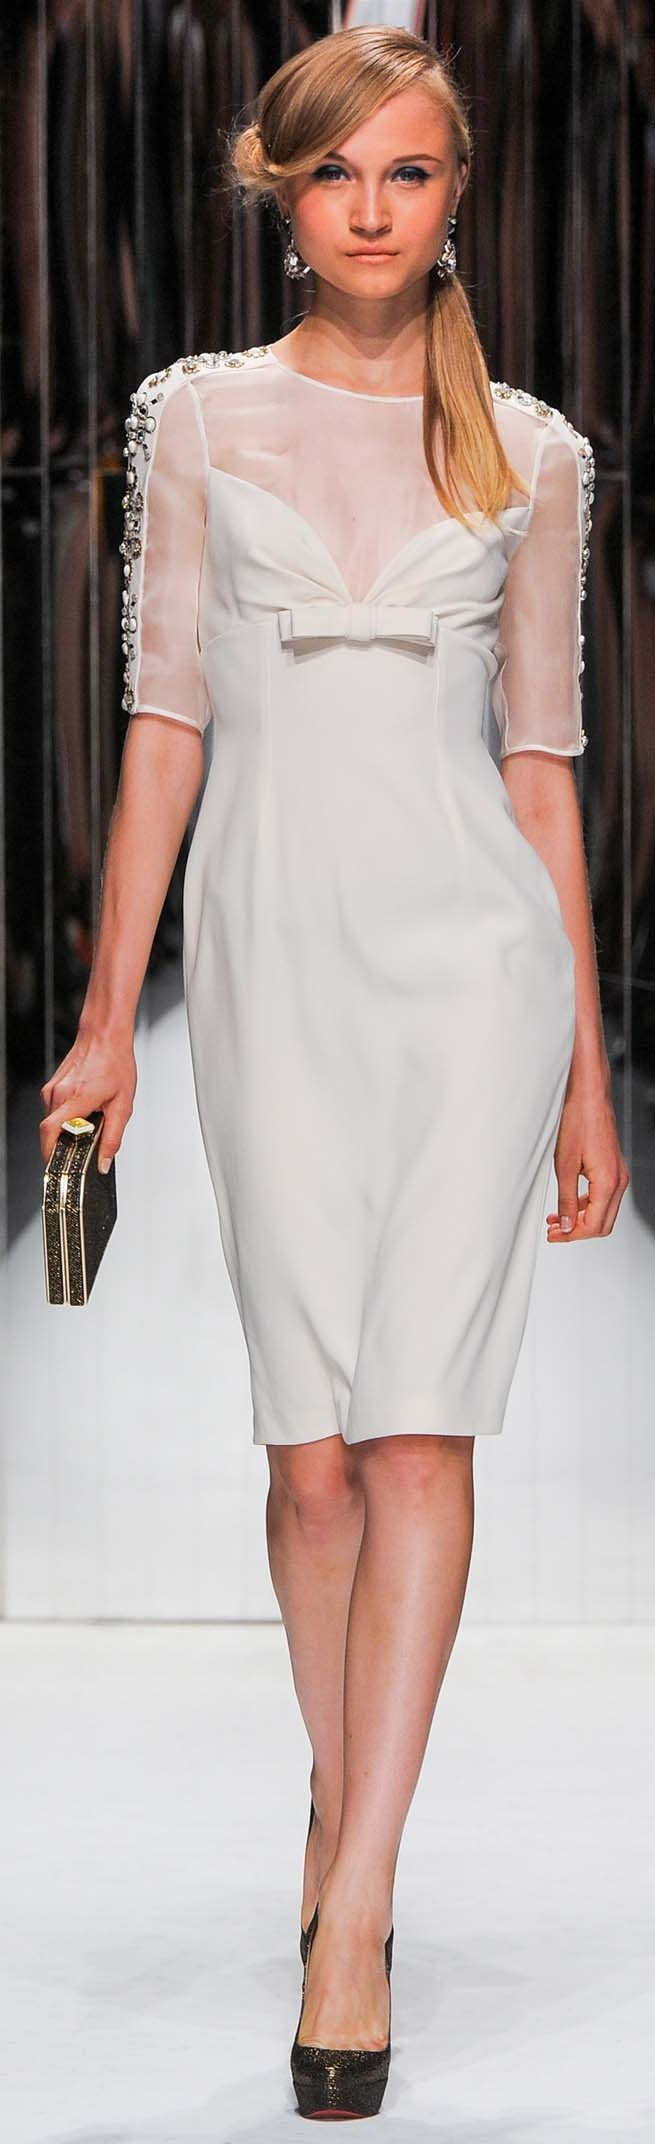 Jenny Packham Spring Summer 2013 Ready-To-Wear Dresses